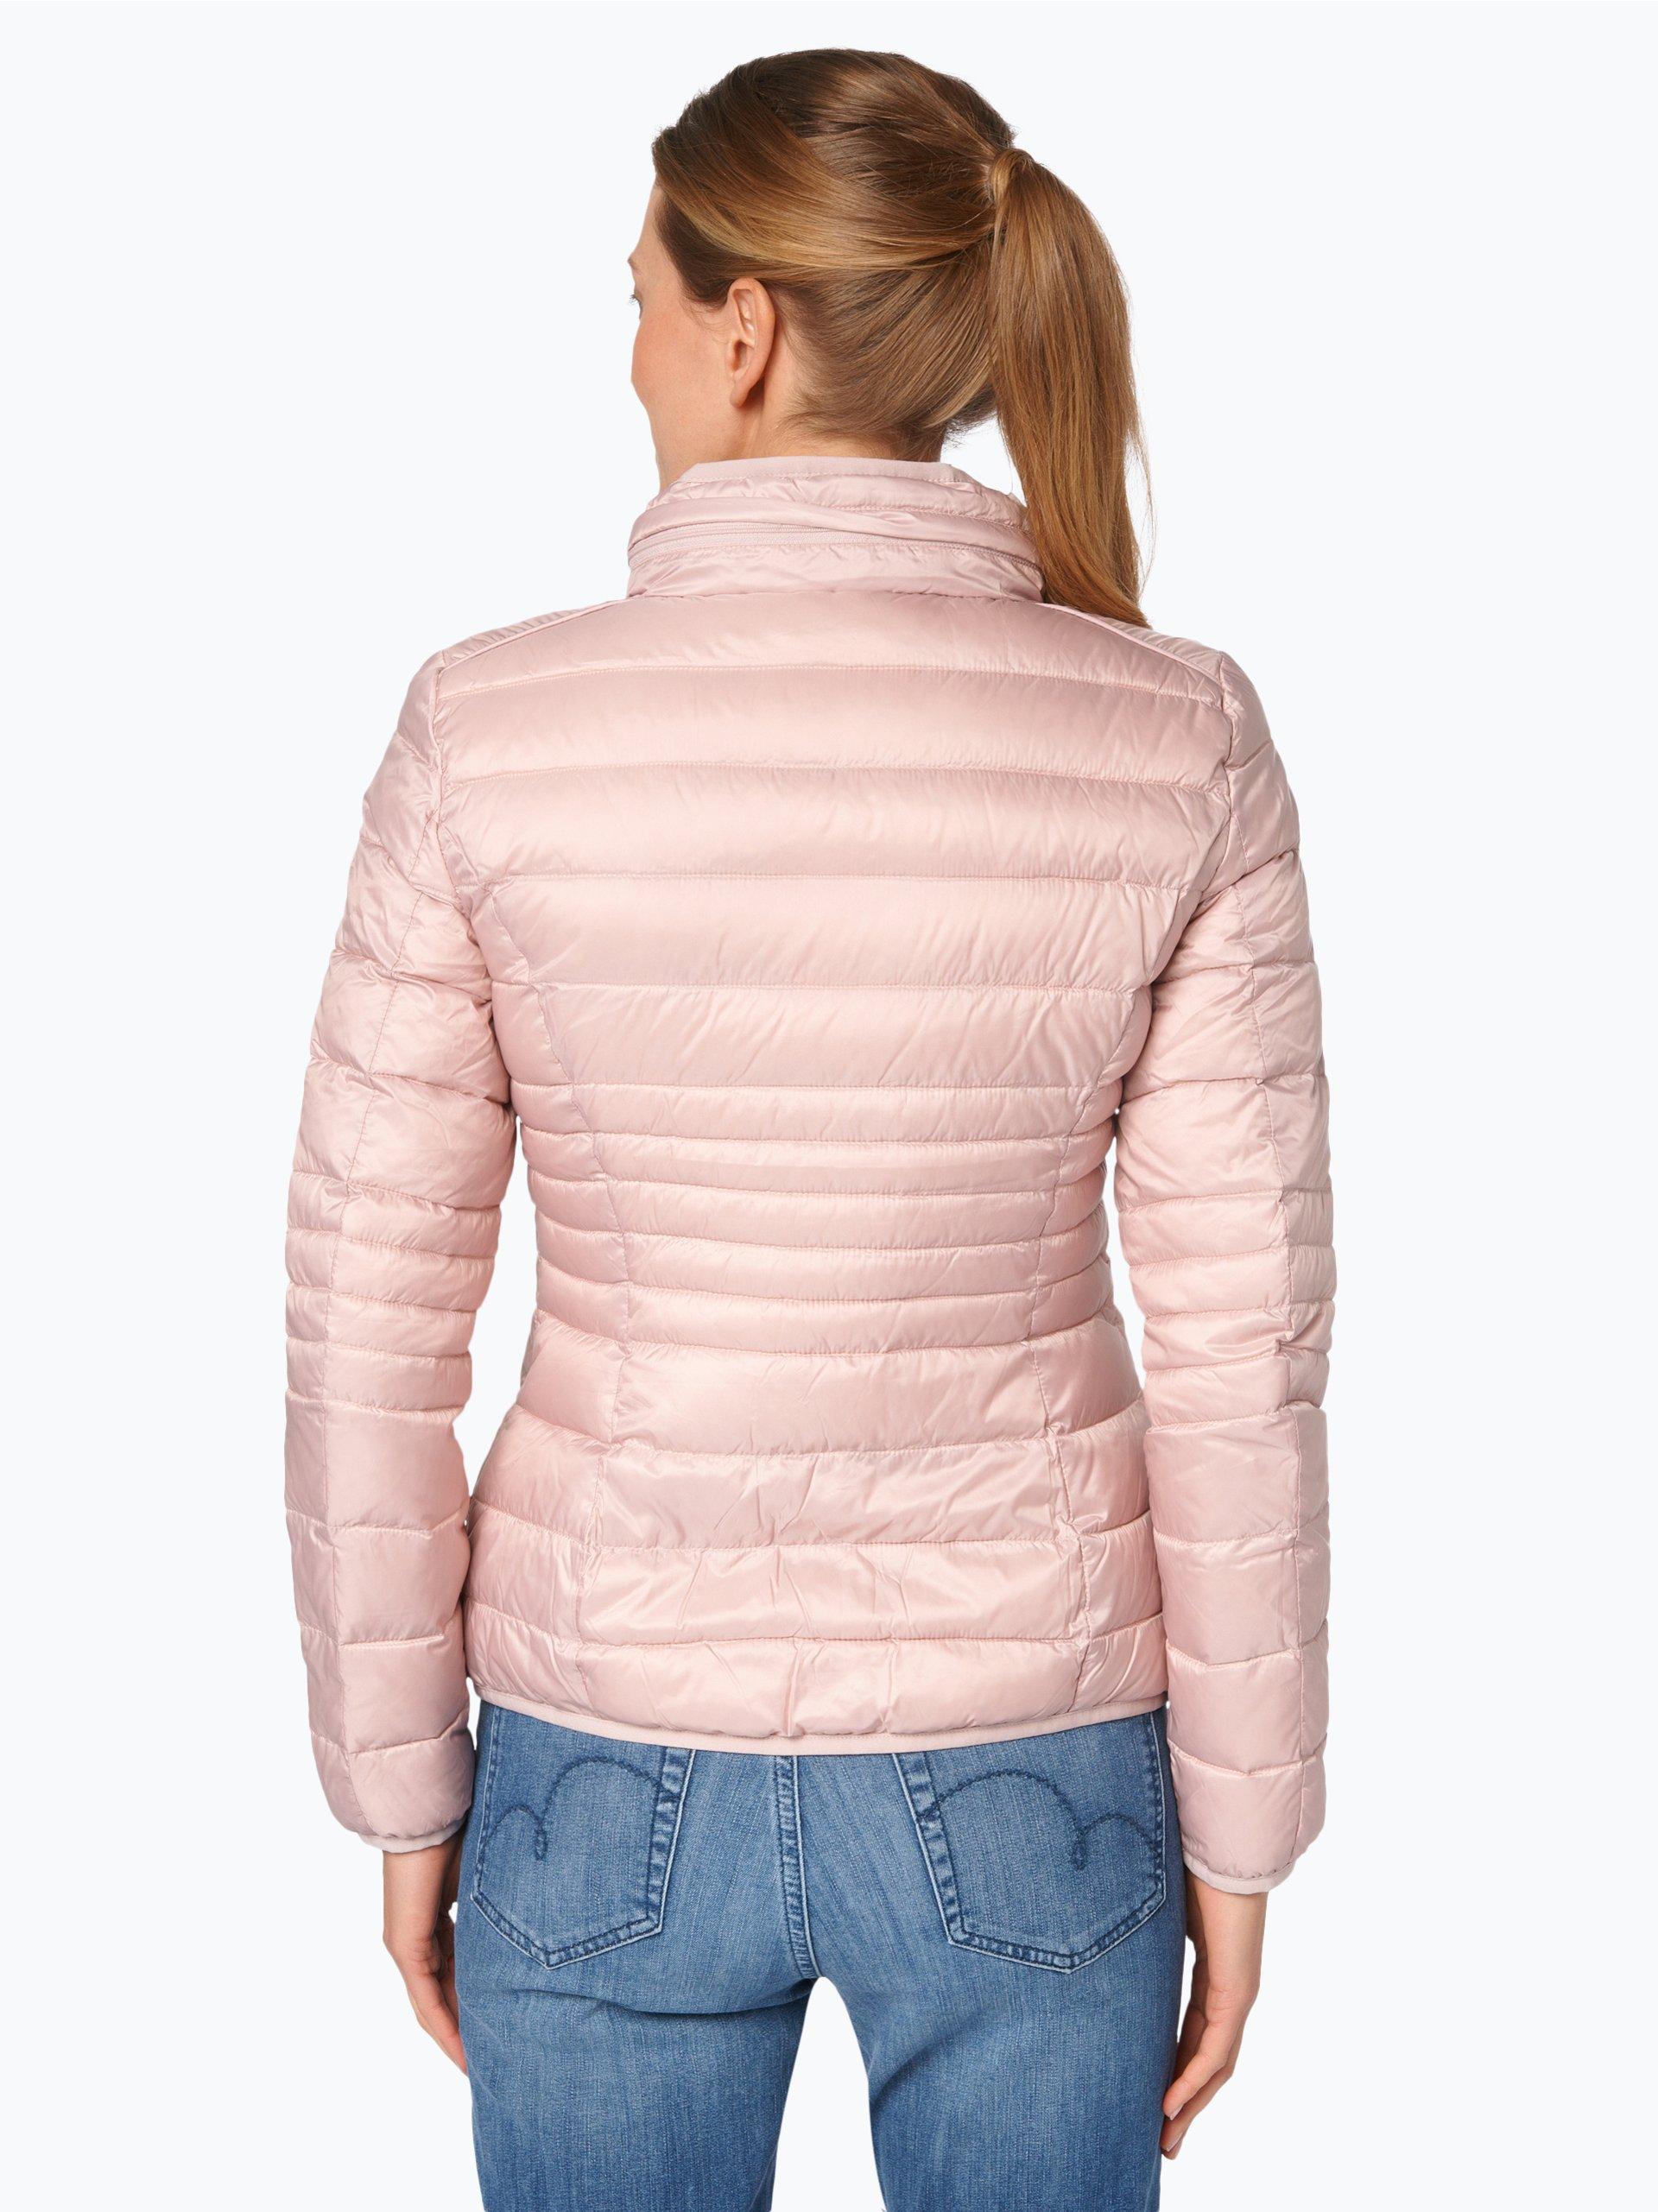 esprit casual damen daunenjacke rosa uni online kaufen peek und cloppenburg de. Black Bedroom Furniture Sets. Home Design Ideas